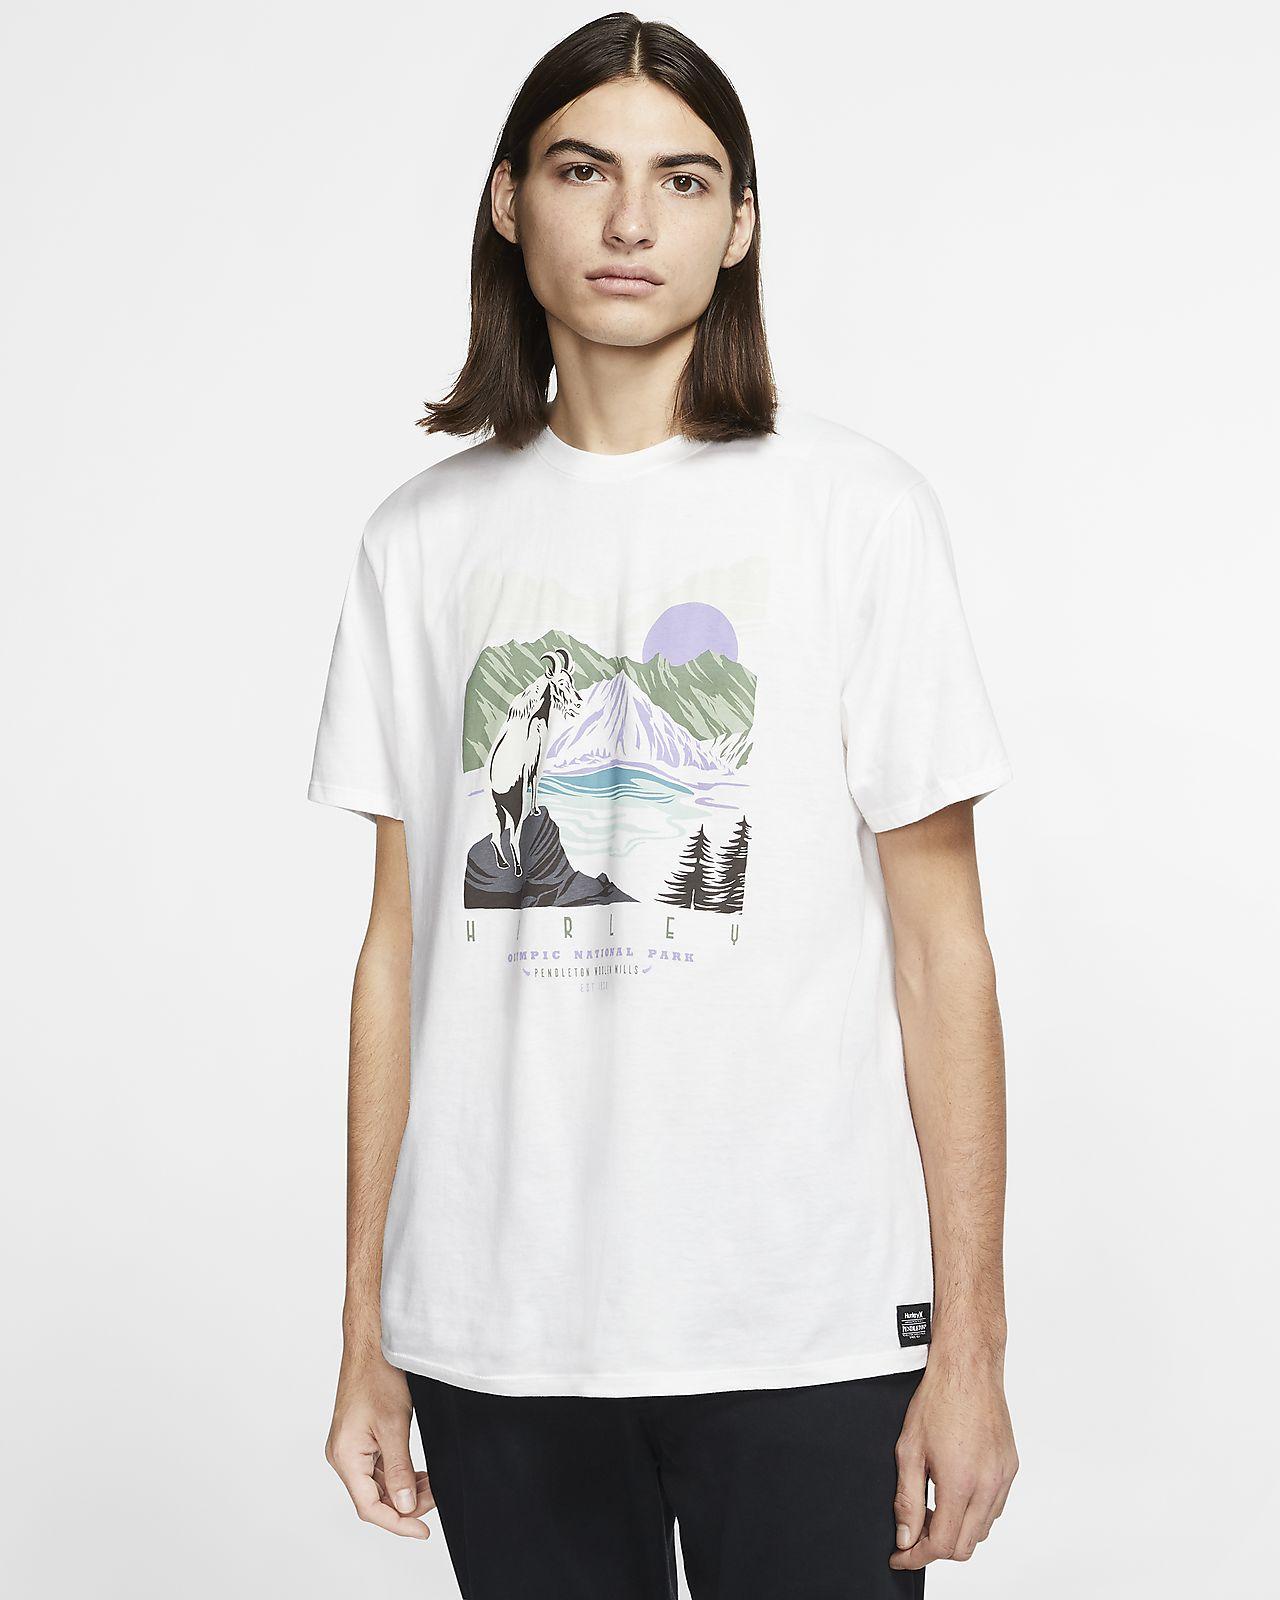 Hurley x Pendleton Olympic Park Camiseta - Hombre